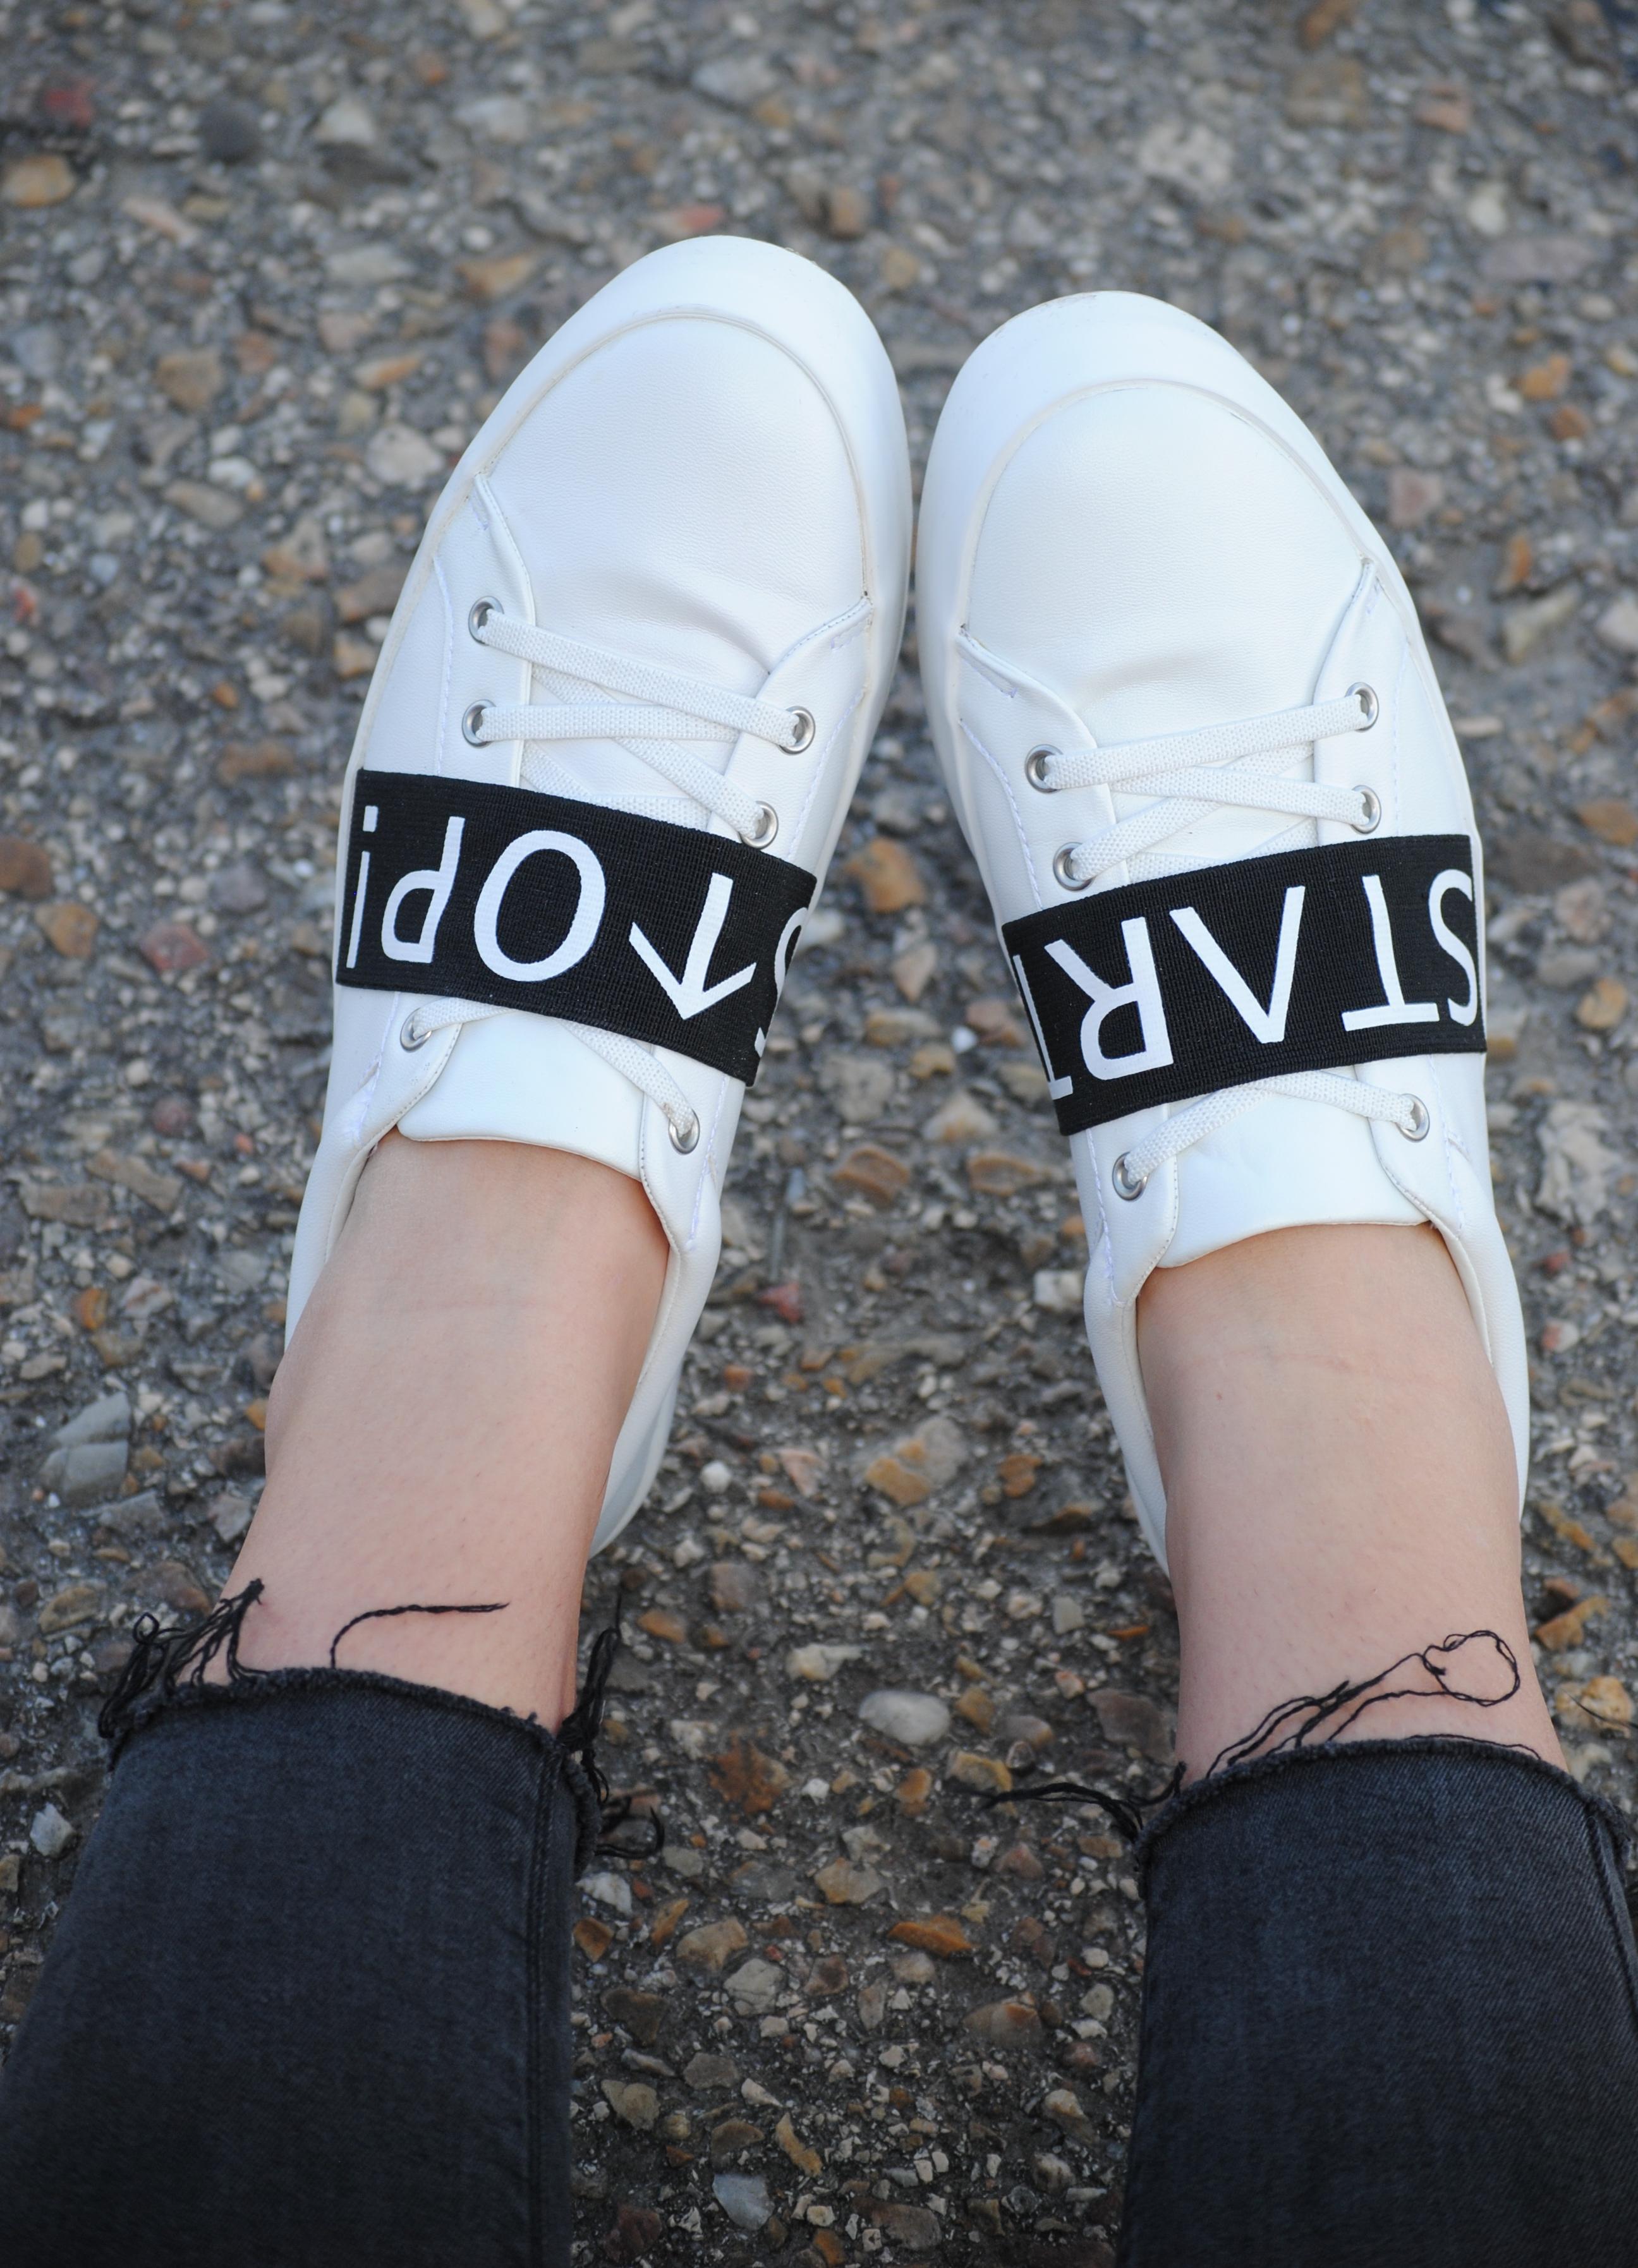 Stop Stop Zara Sneakers Sneakers Zara Zara Start Start Sneakers Start Start Stop EX1qcU